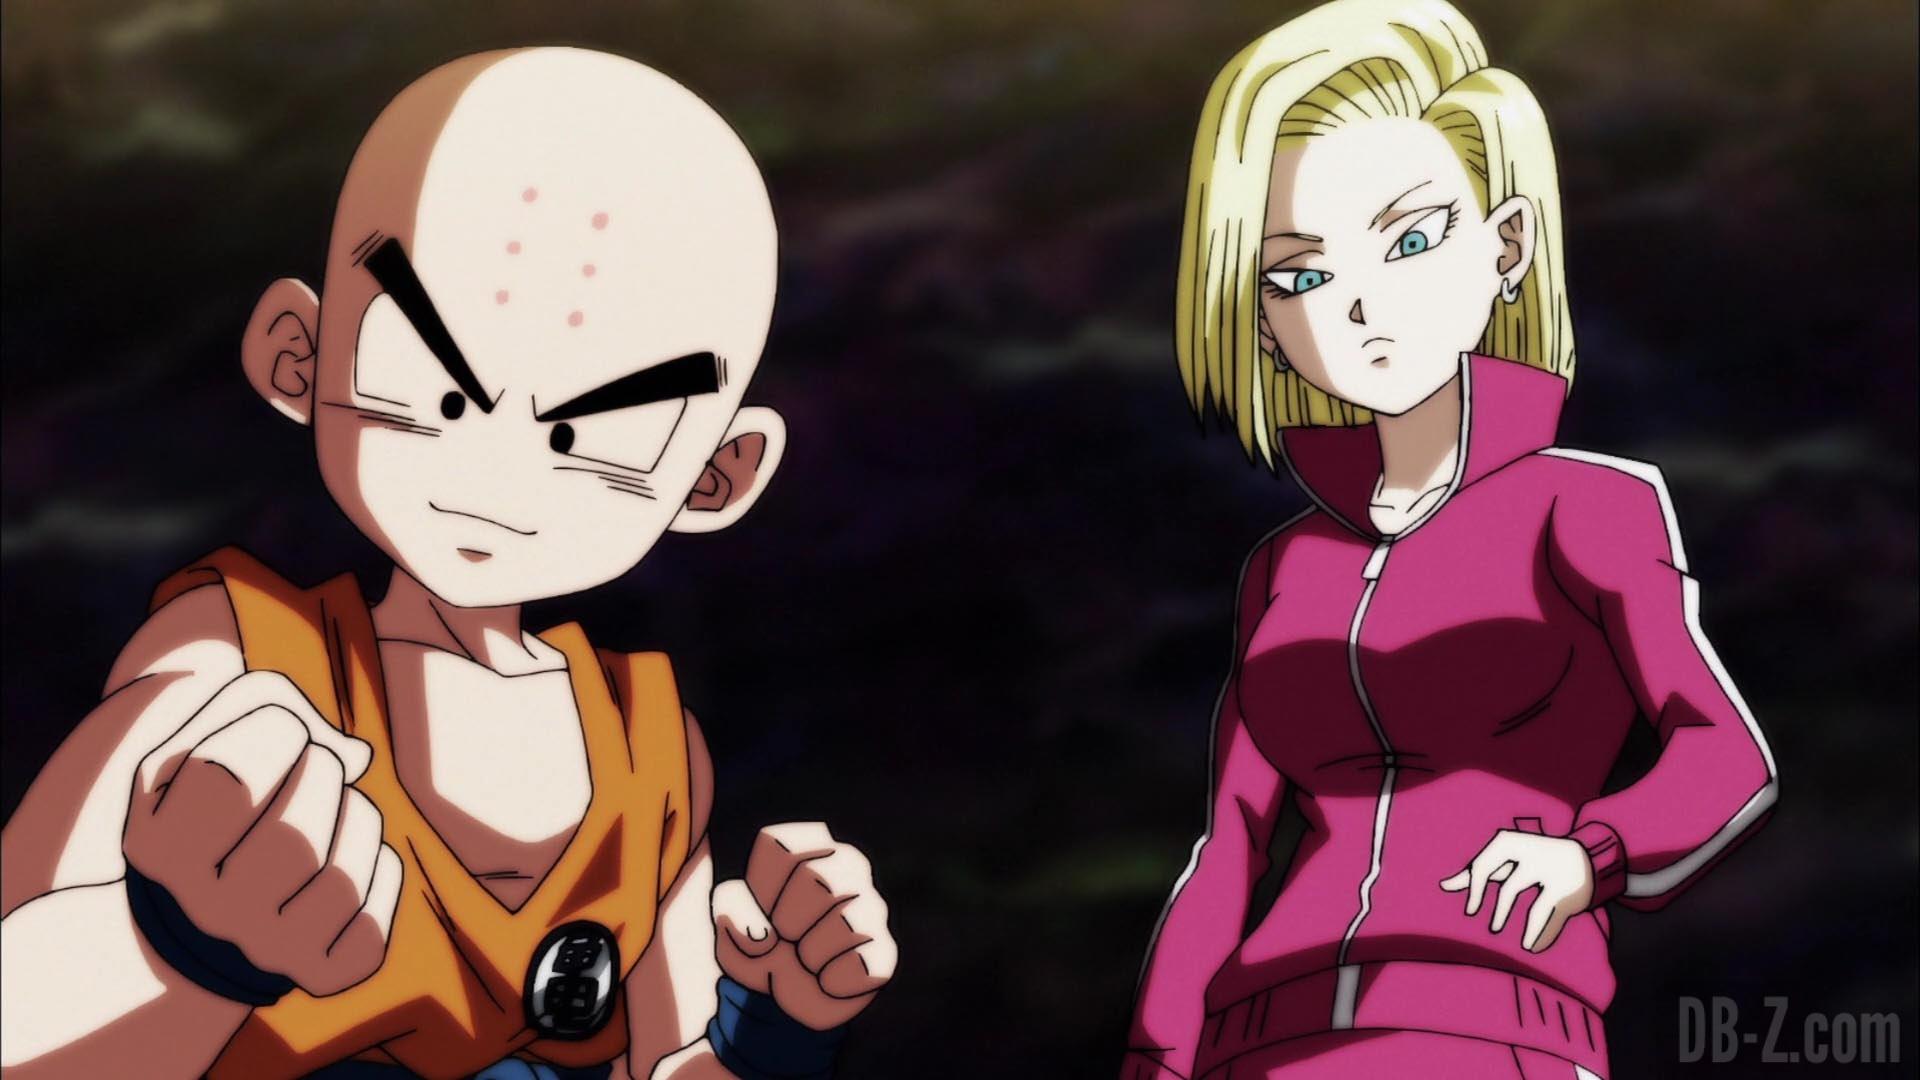 Dragon-Ball-Super-Episode-99-80-C-18-Kri